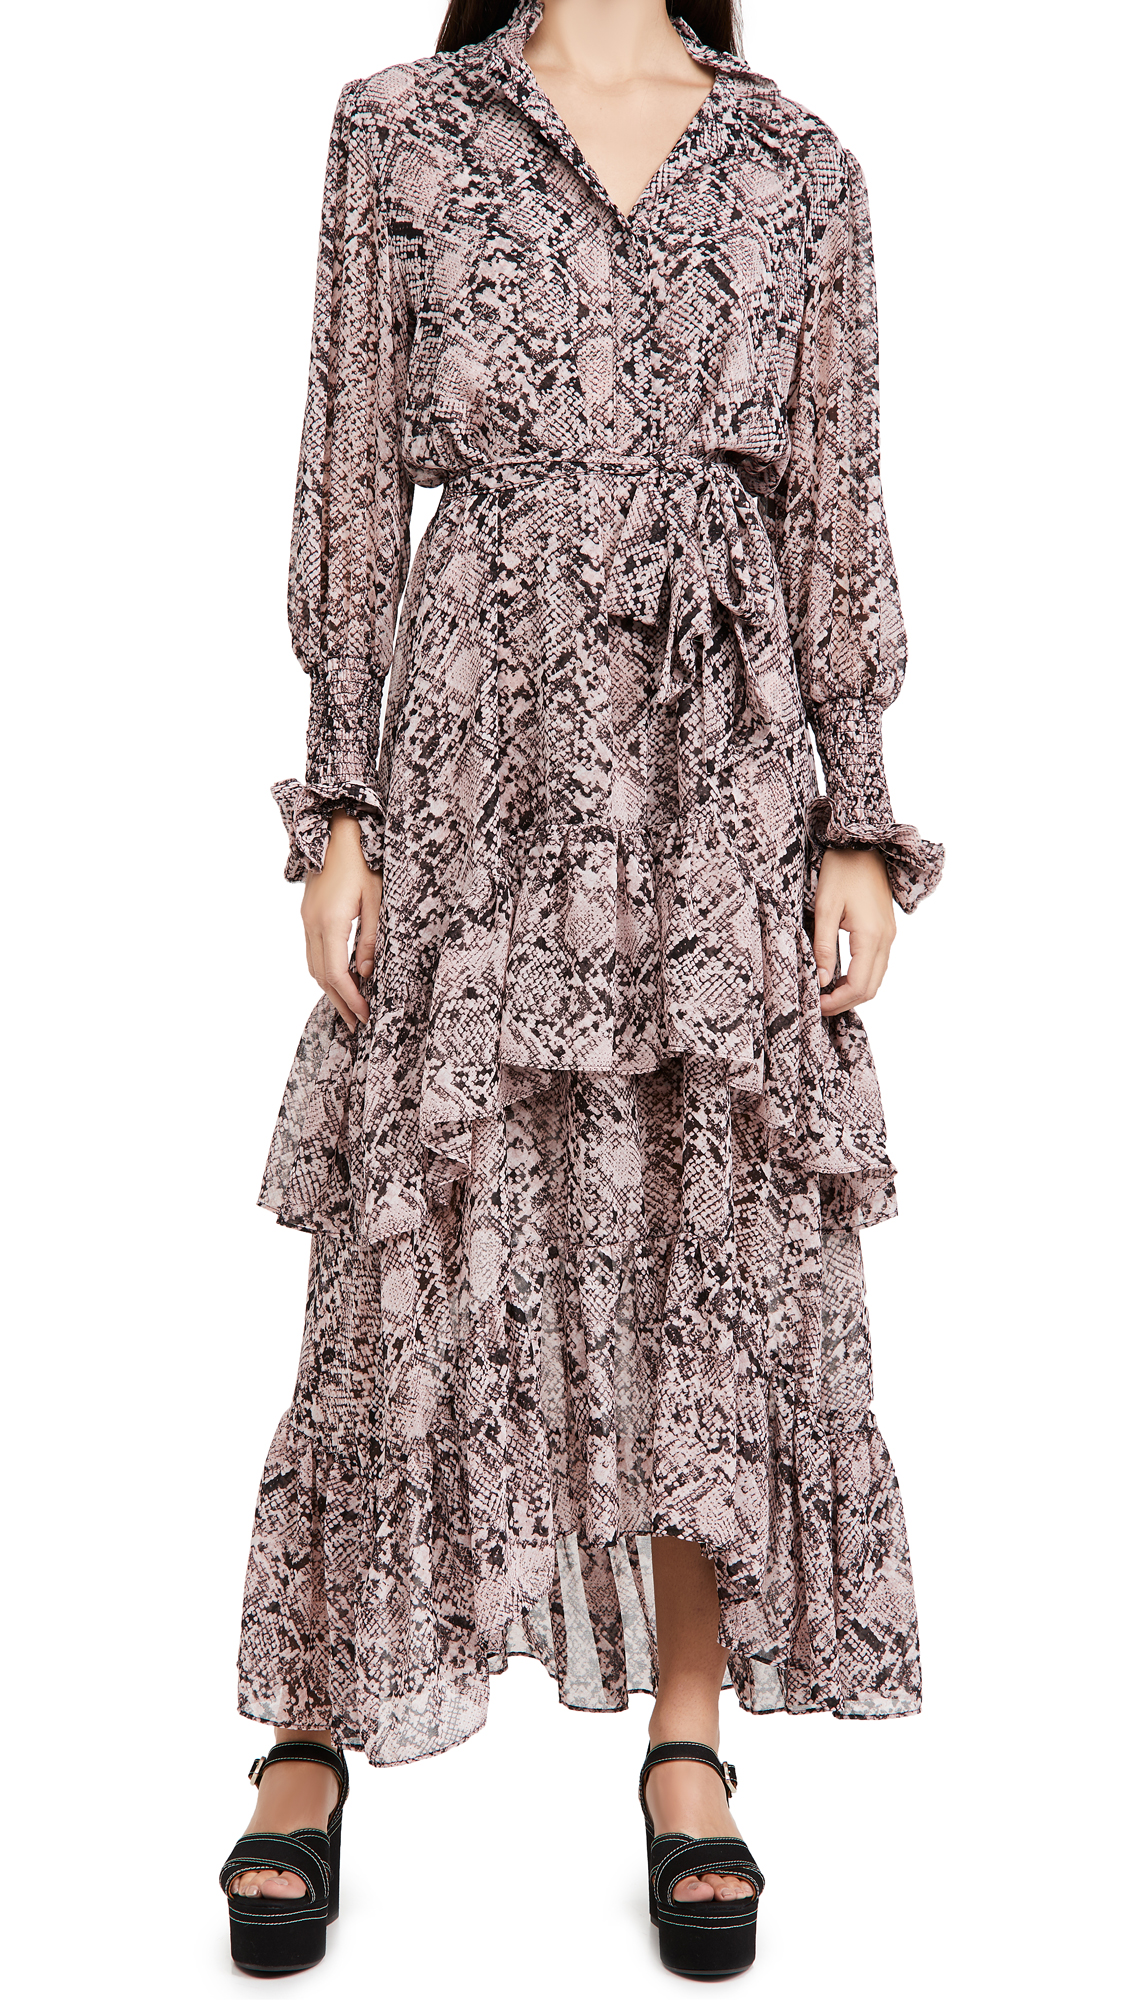 MISA Valentina Dress